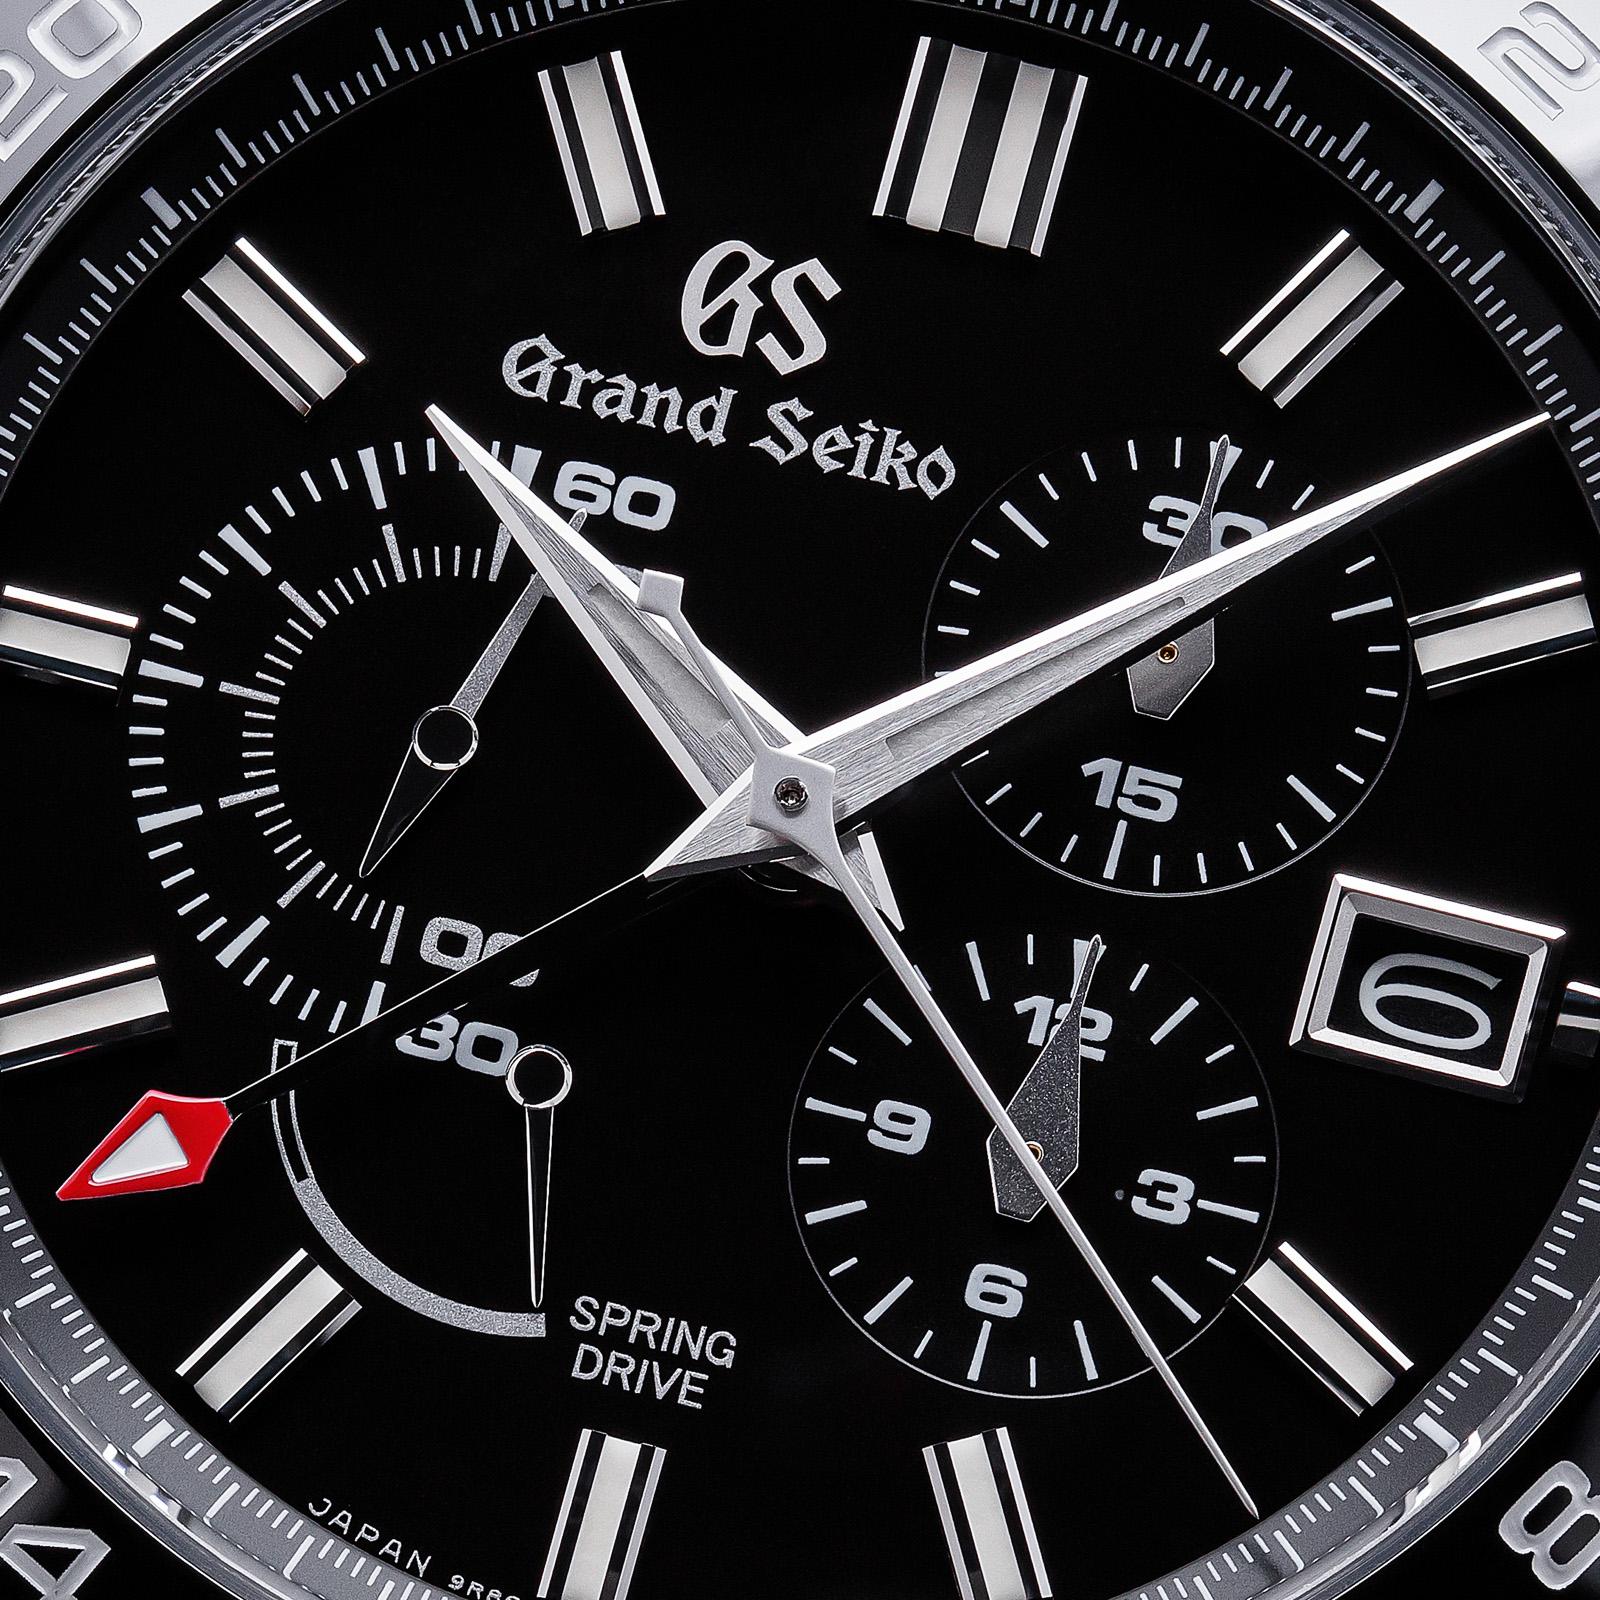 Grand Seiko SBGC223 Chronograph - macro of black dial.